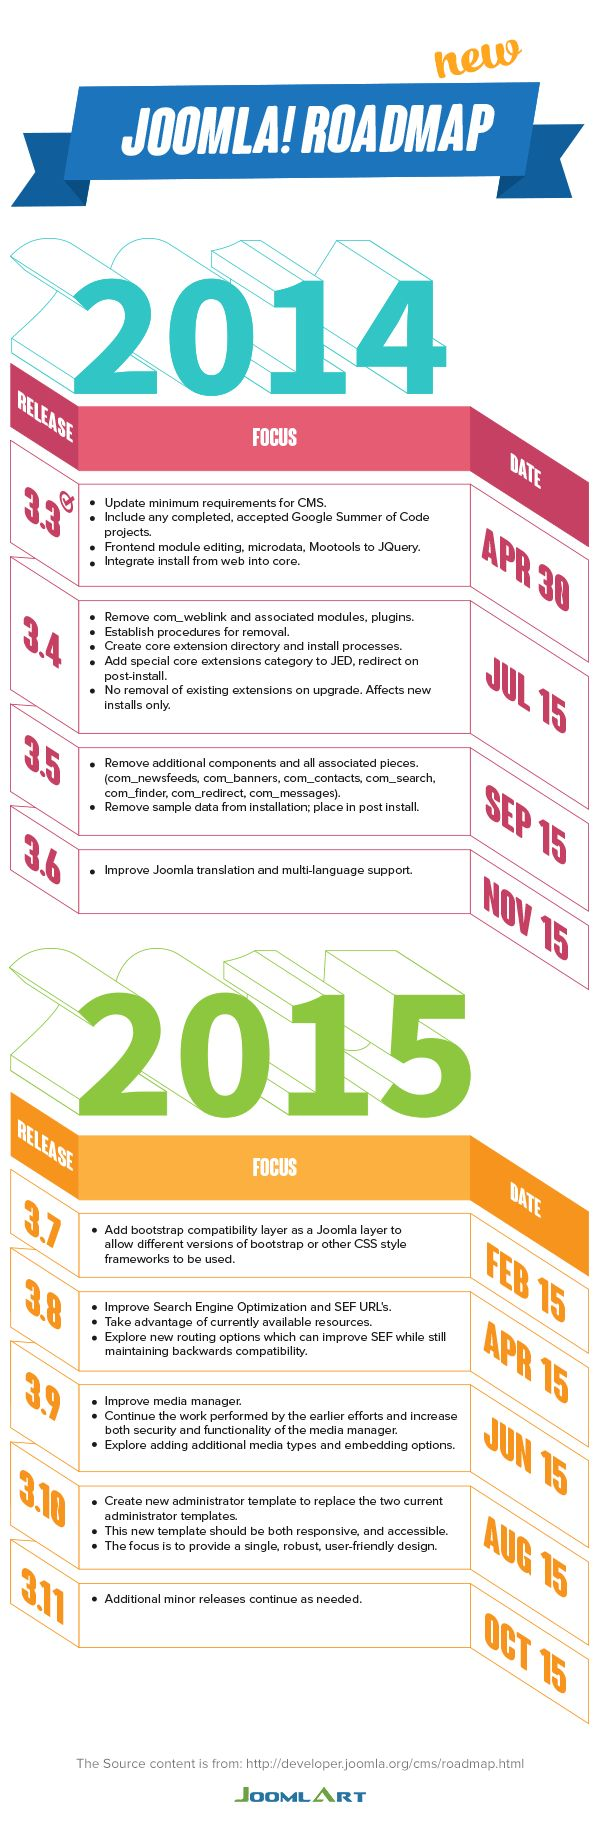 Joomla roadmap for 2014-2015  via http://www.joomlart.com/blog/news-updates/the-new-joomla-roadmap